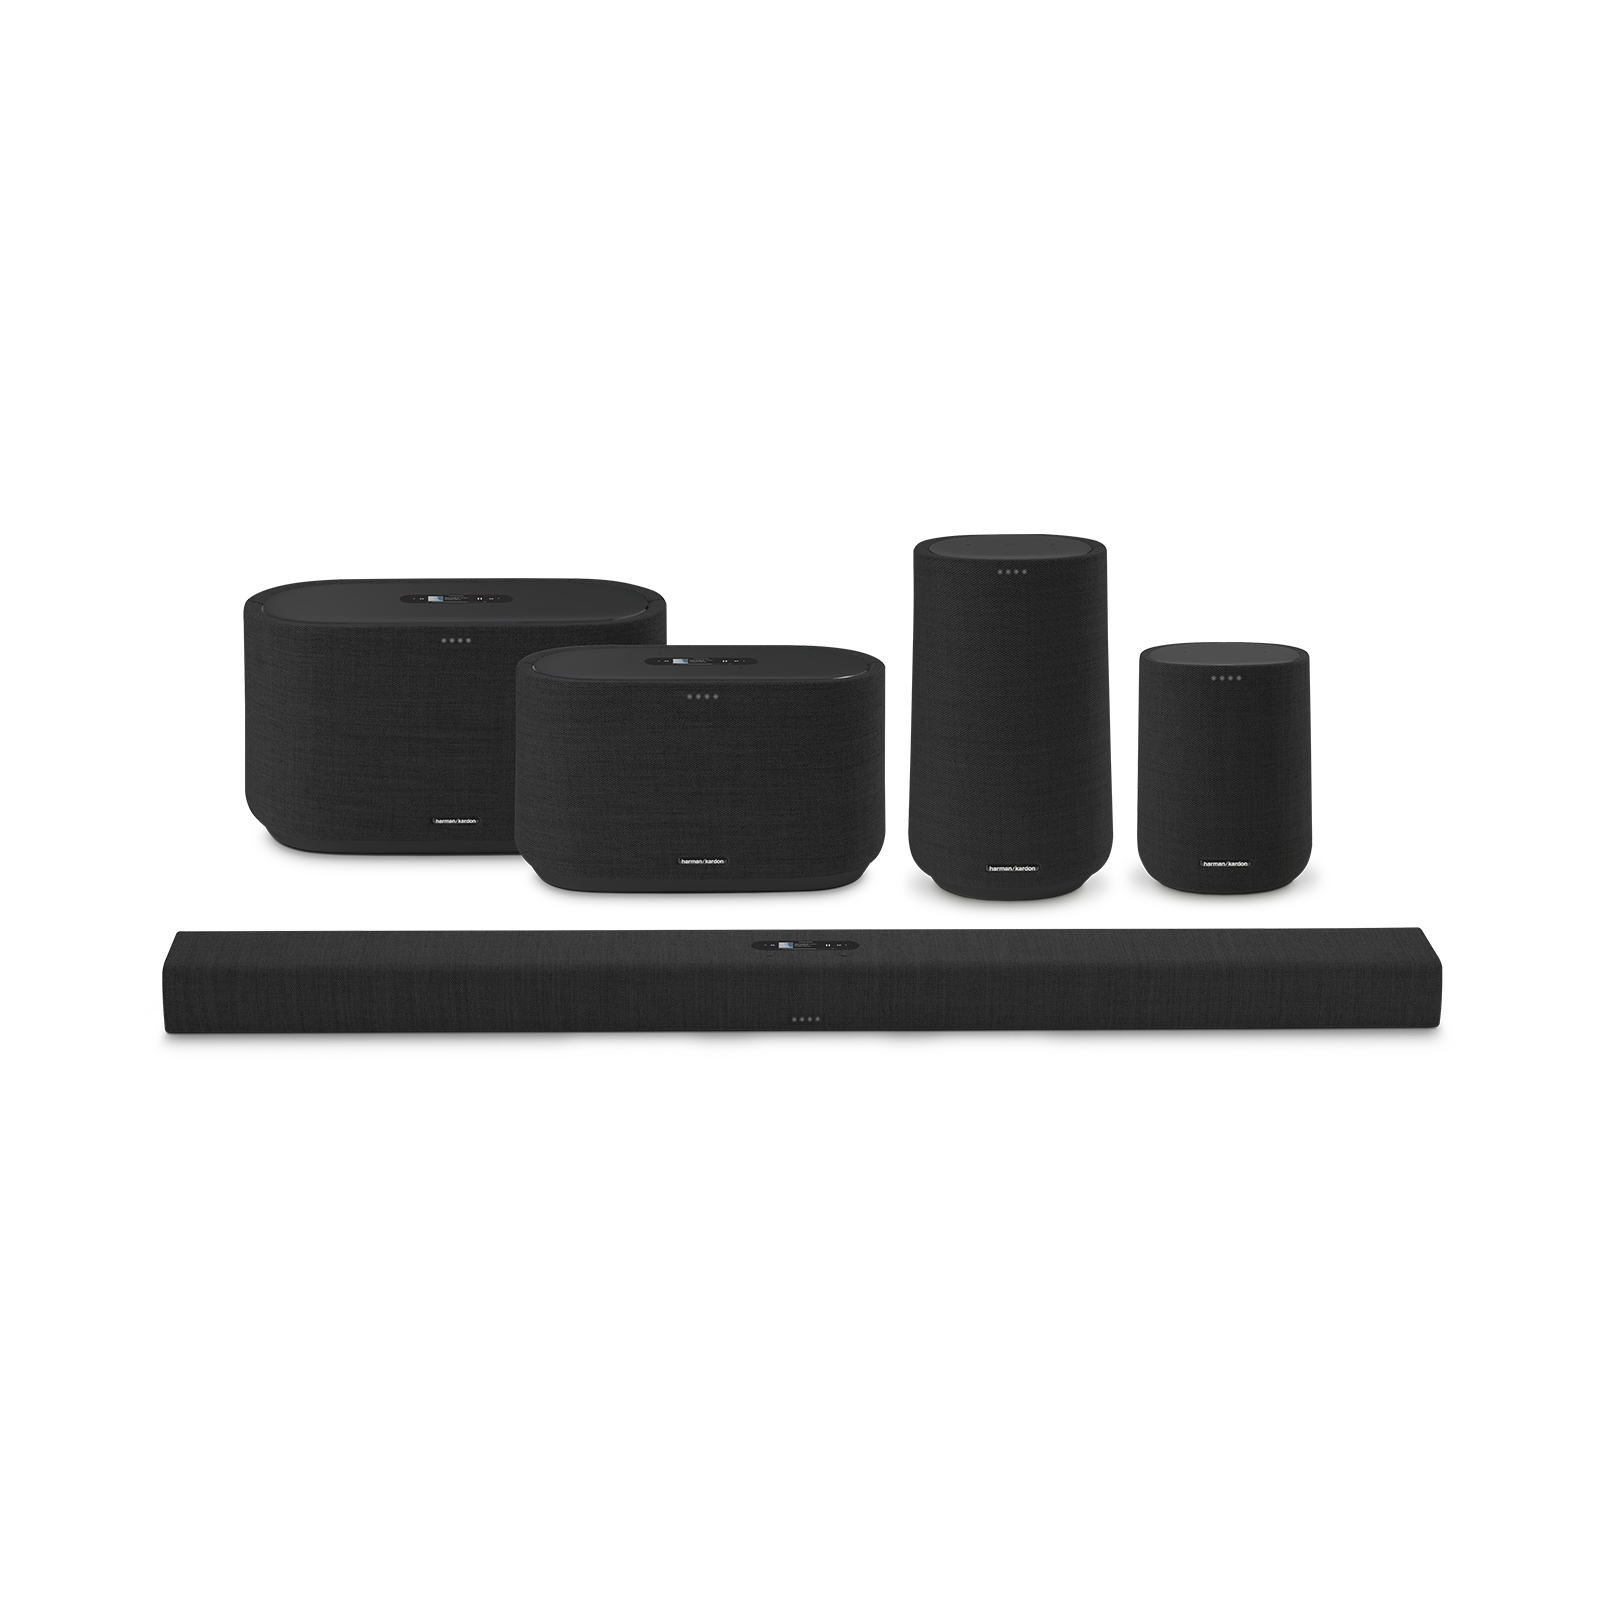 Harman Kardon Citation ONE - Black - Compact, smart and amazing sound - Detailshot 5